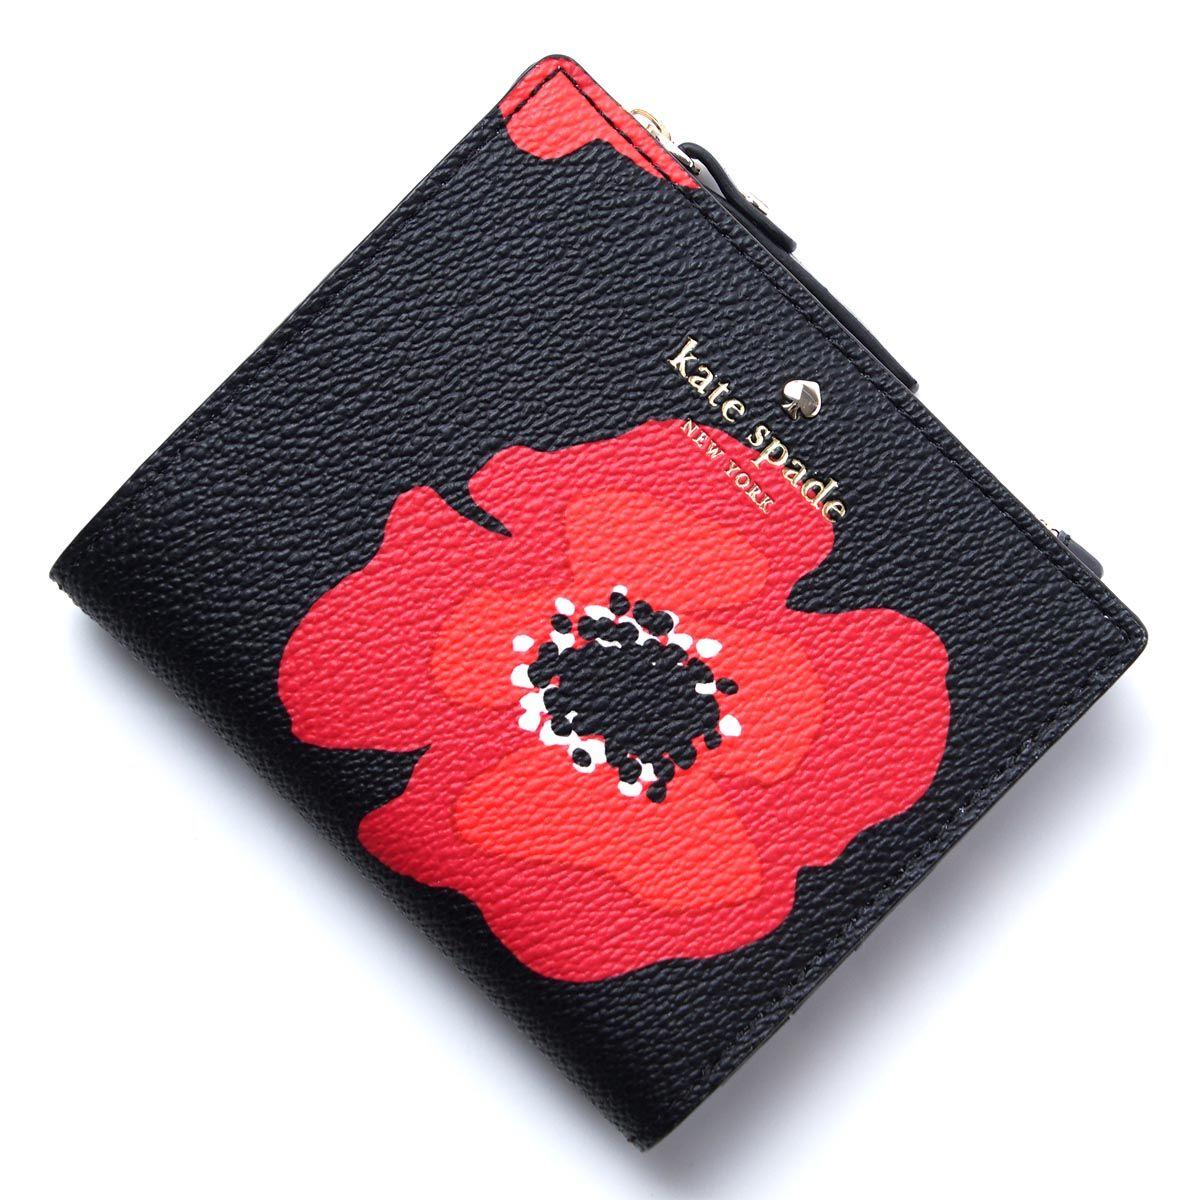 39ee5bcd0002 NWT Kate Spade Hyde Lane Red Poppy Women's Adalyn Small Bifold Black Snap  Wallet #katespade #poppy #luxefashionfinds